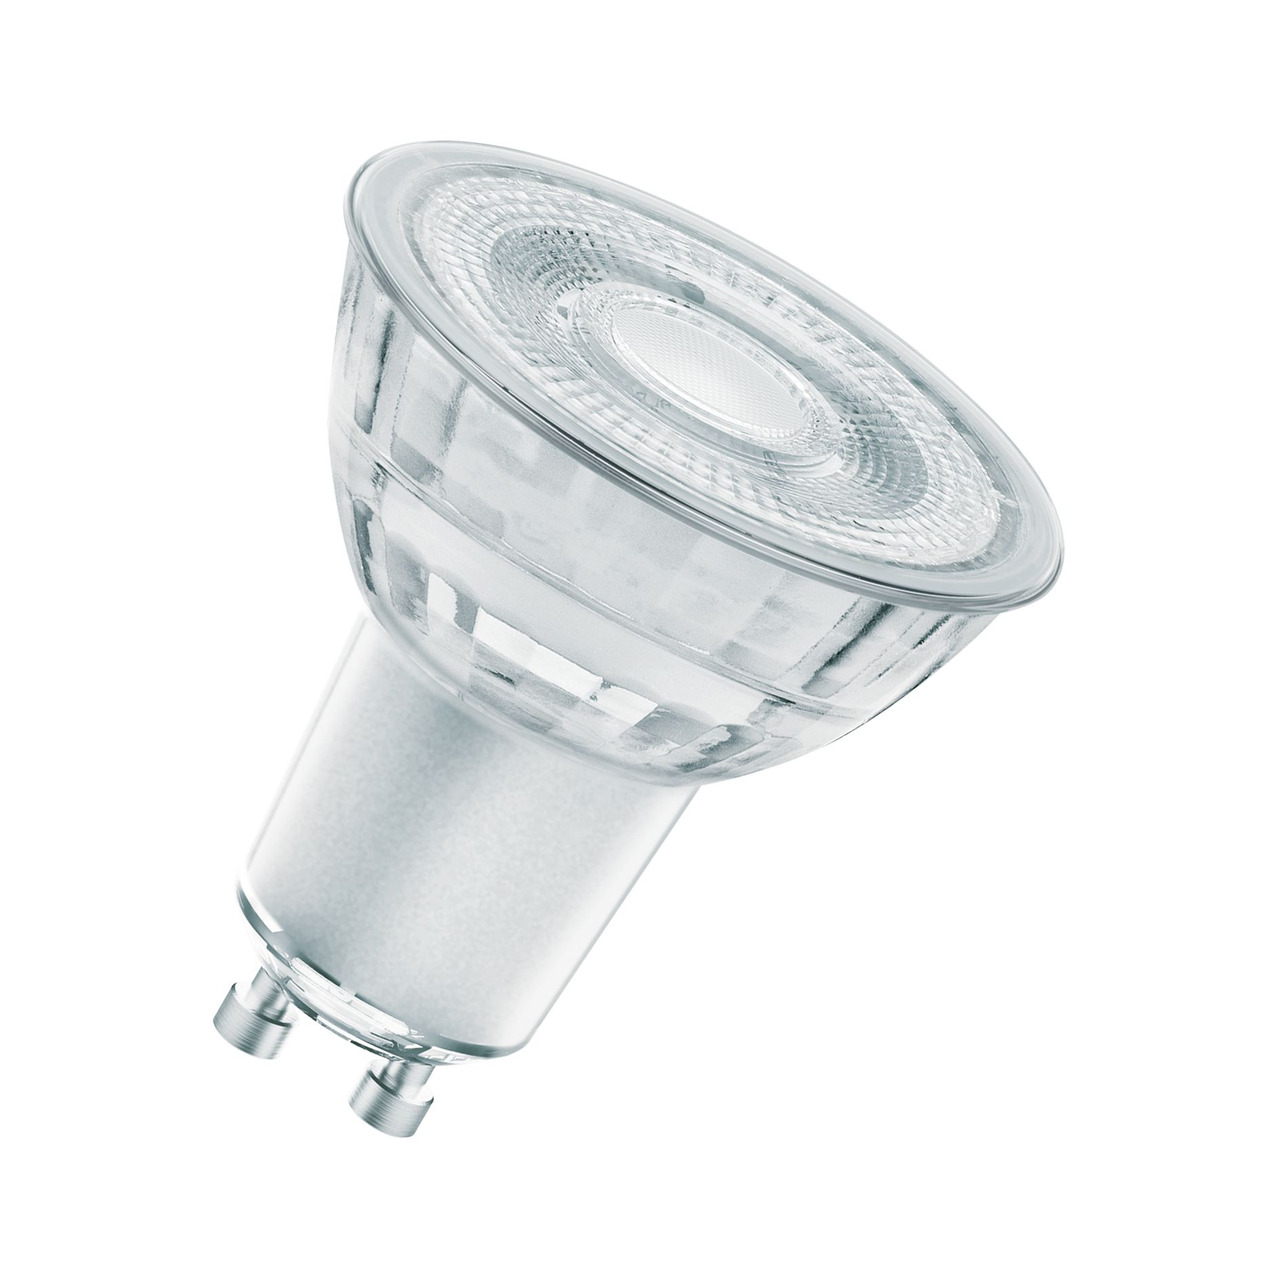 OSRAM LED STAR Plus 4-6-W-GU10-LED-Lampe 36- warmweiss- dimmbar (GLOWdim)